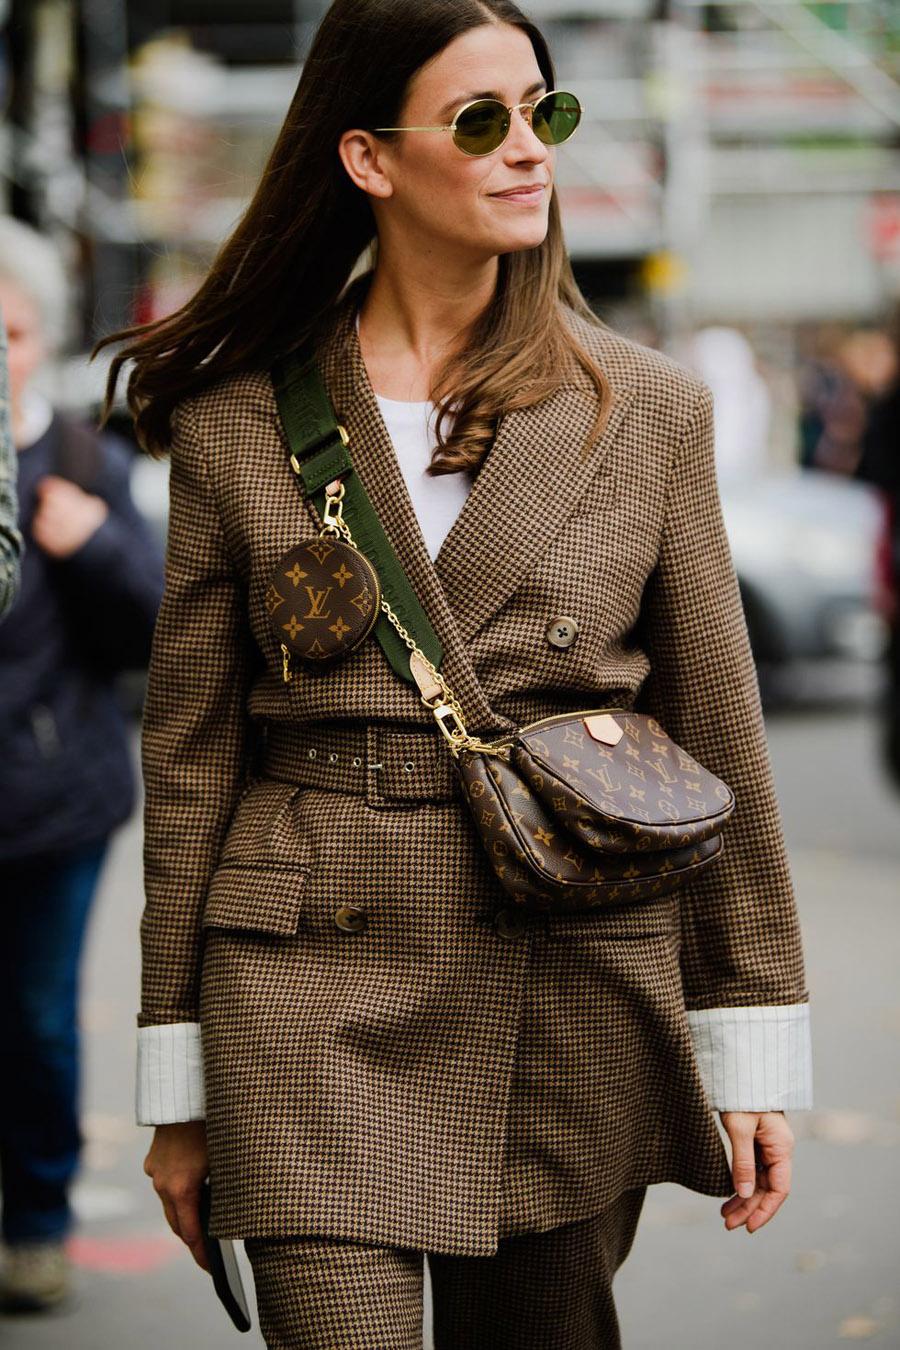 paris-fashion-week-pfw-street-style-ss20-day-4-by-tyler-joe-058-1569835056